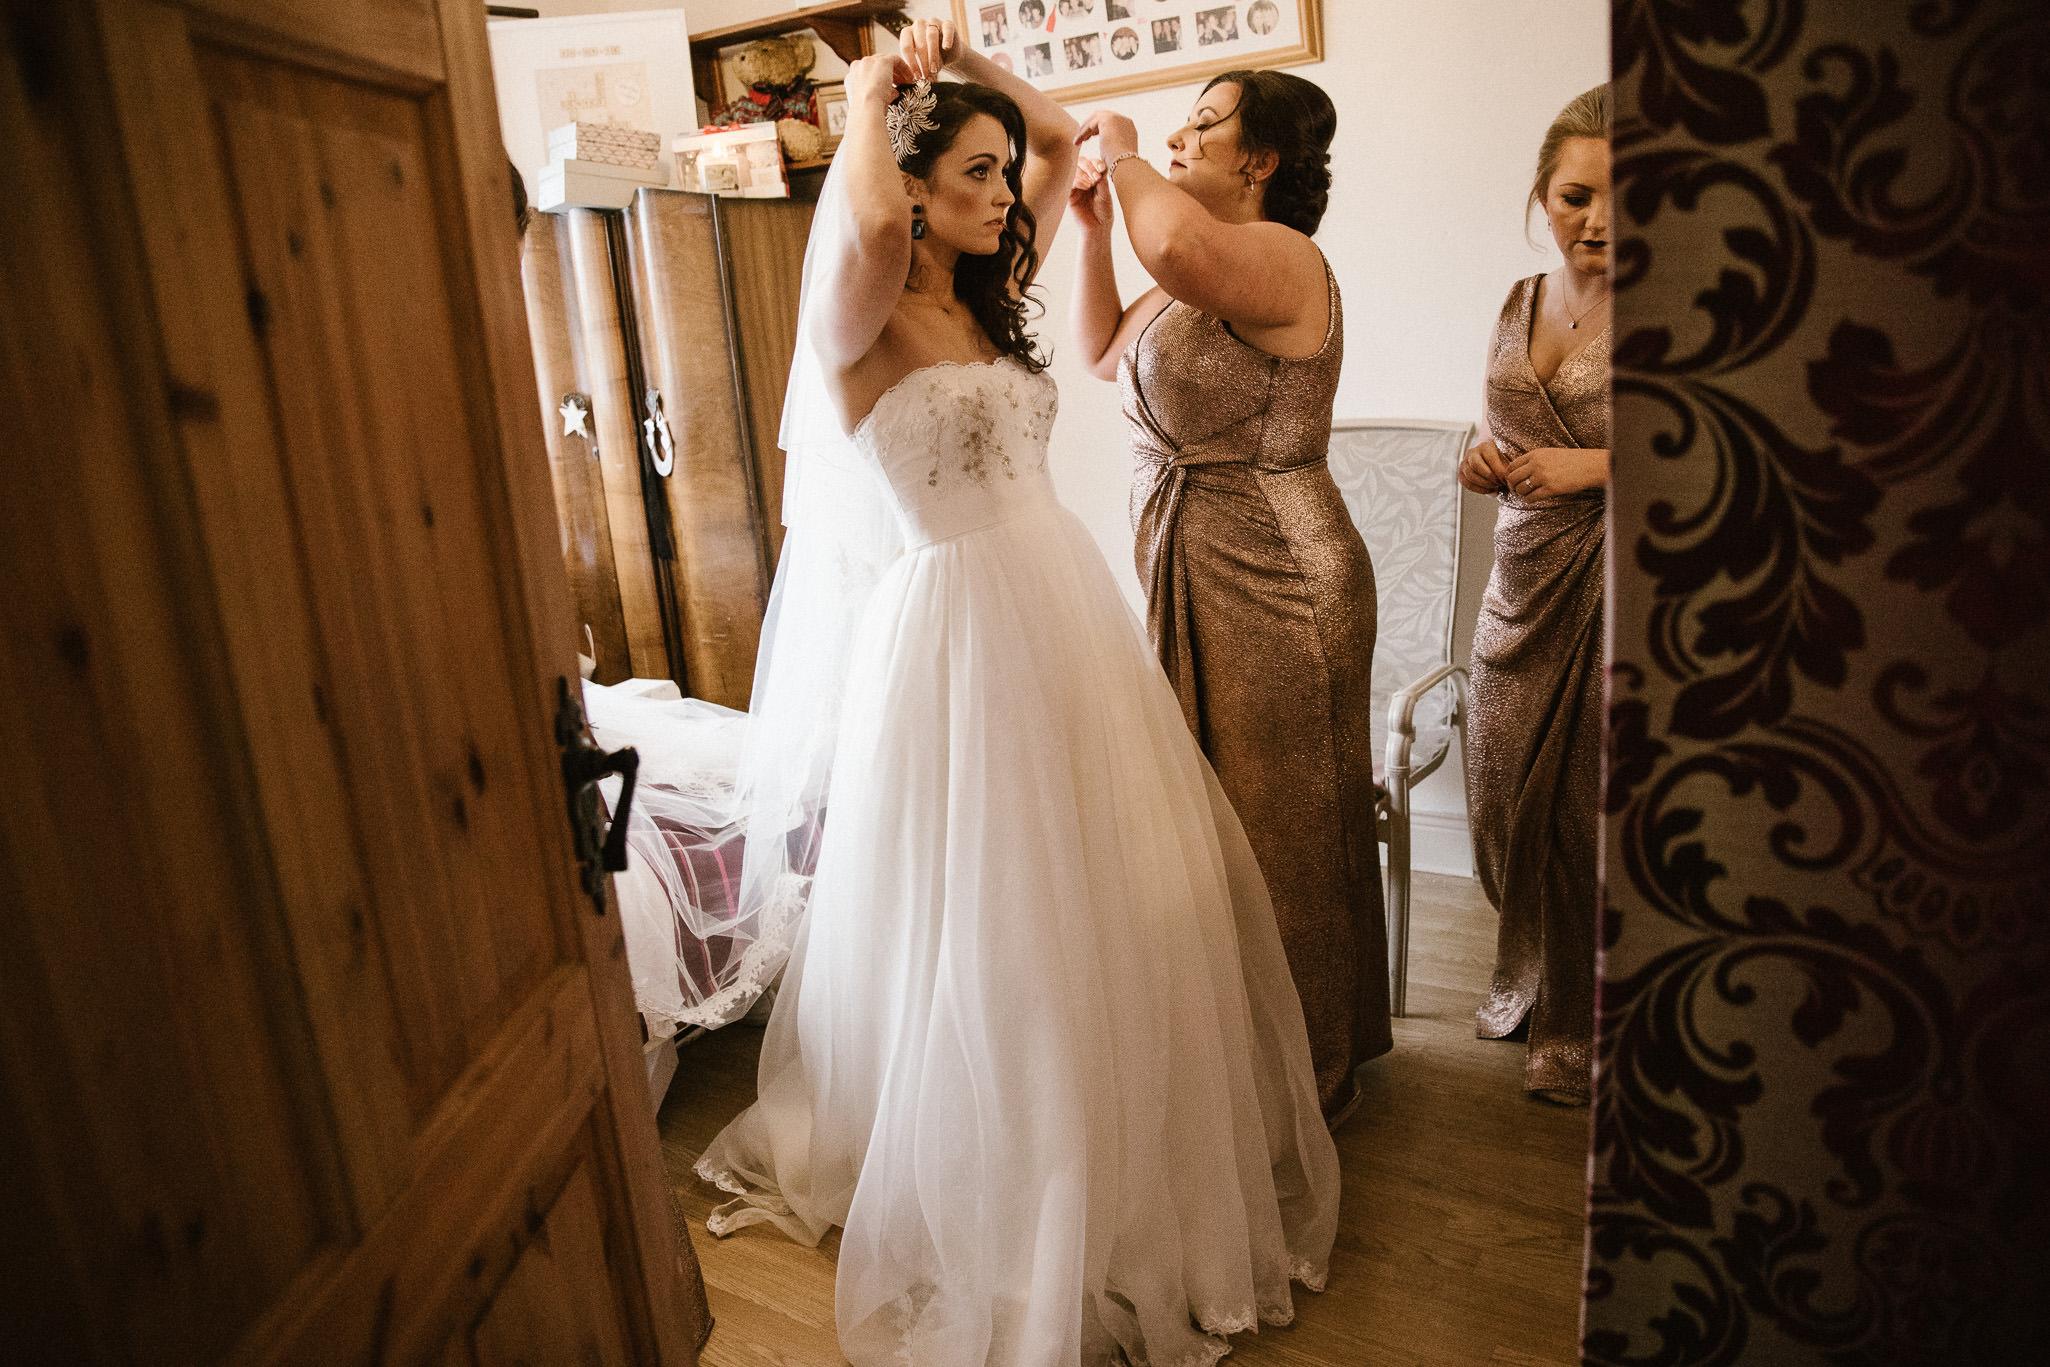 clairebyrnephotography-wedding-night-sparklers-new-years-eve-denyce-leonard-7.jpg